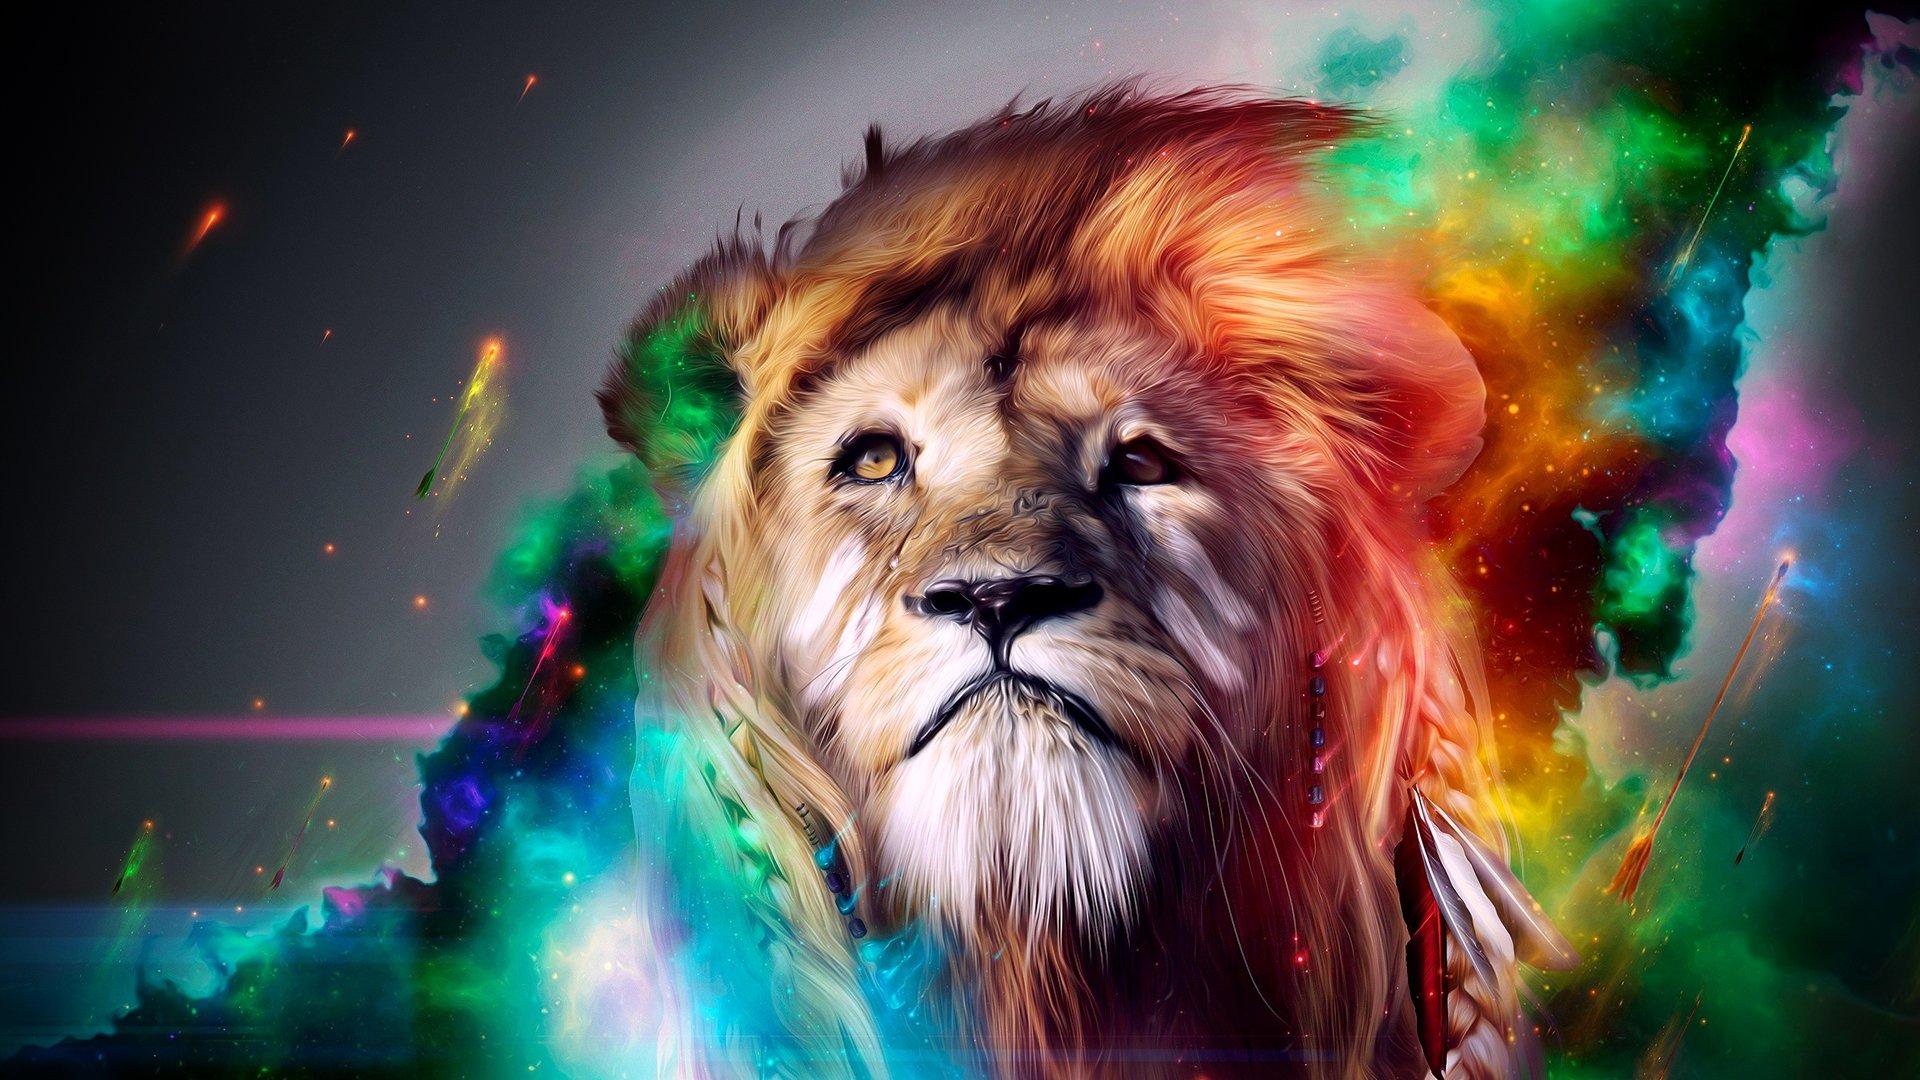 Artistic Colorful Lion Desktop HD Wallpaper   Stylish HD Wallpapers 1920x1080